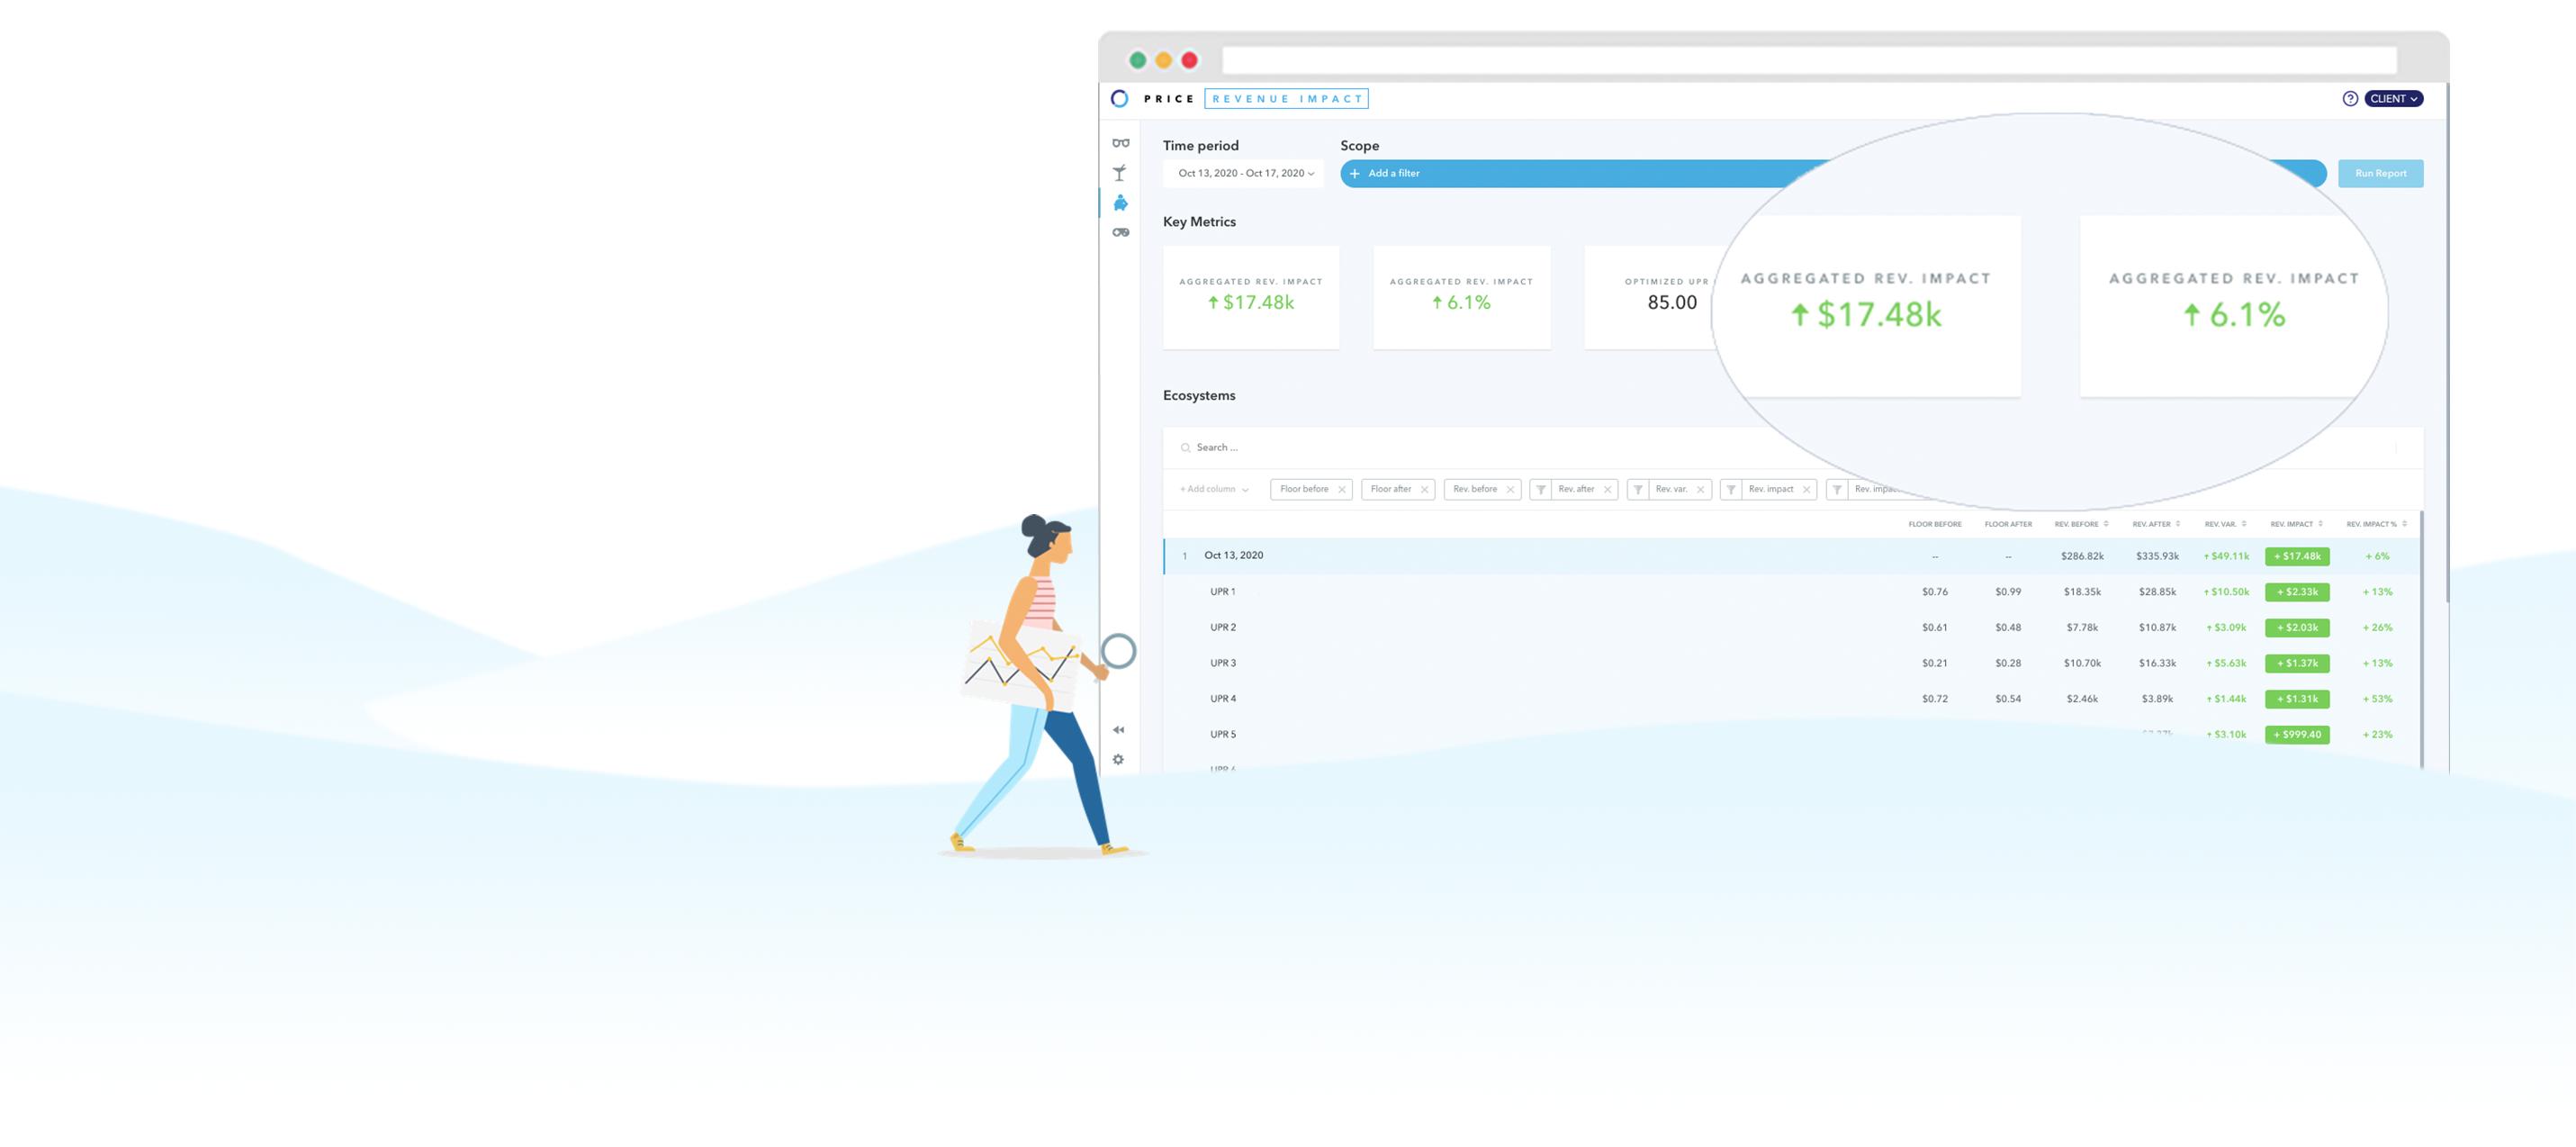 Adomik Price UPR Recommendations - Maximize your programmatic revenue